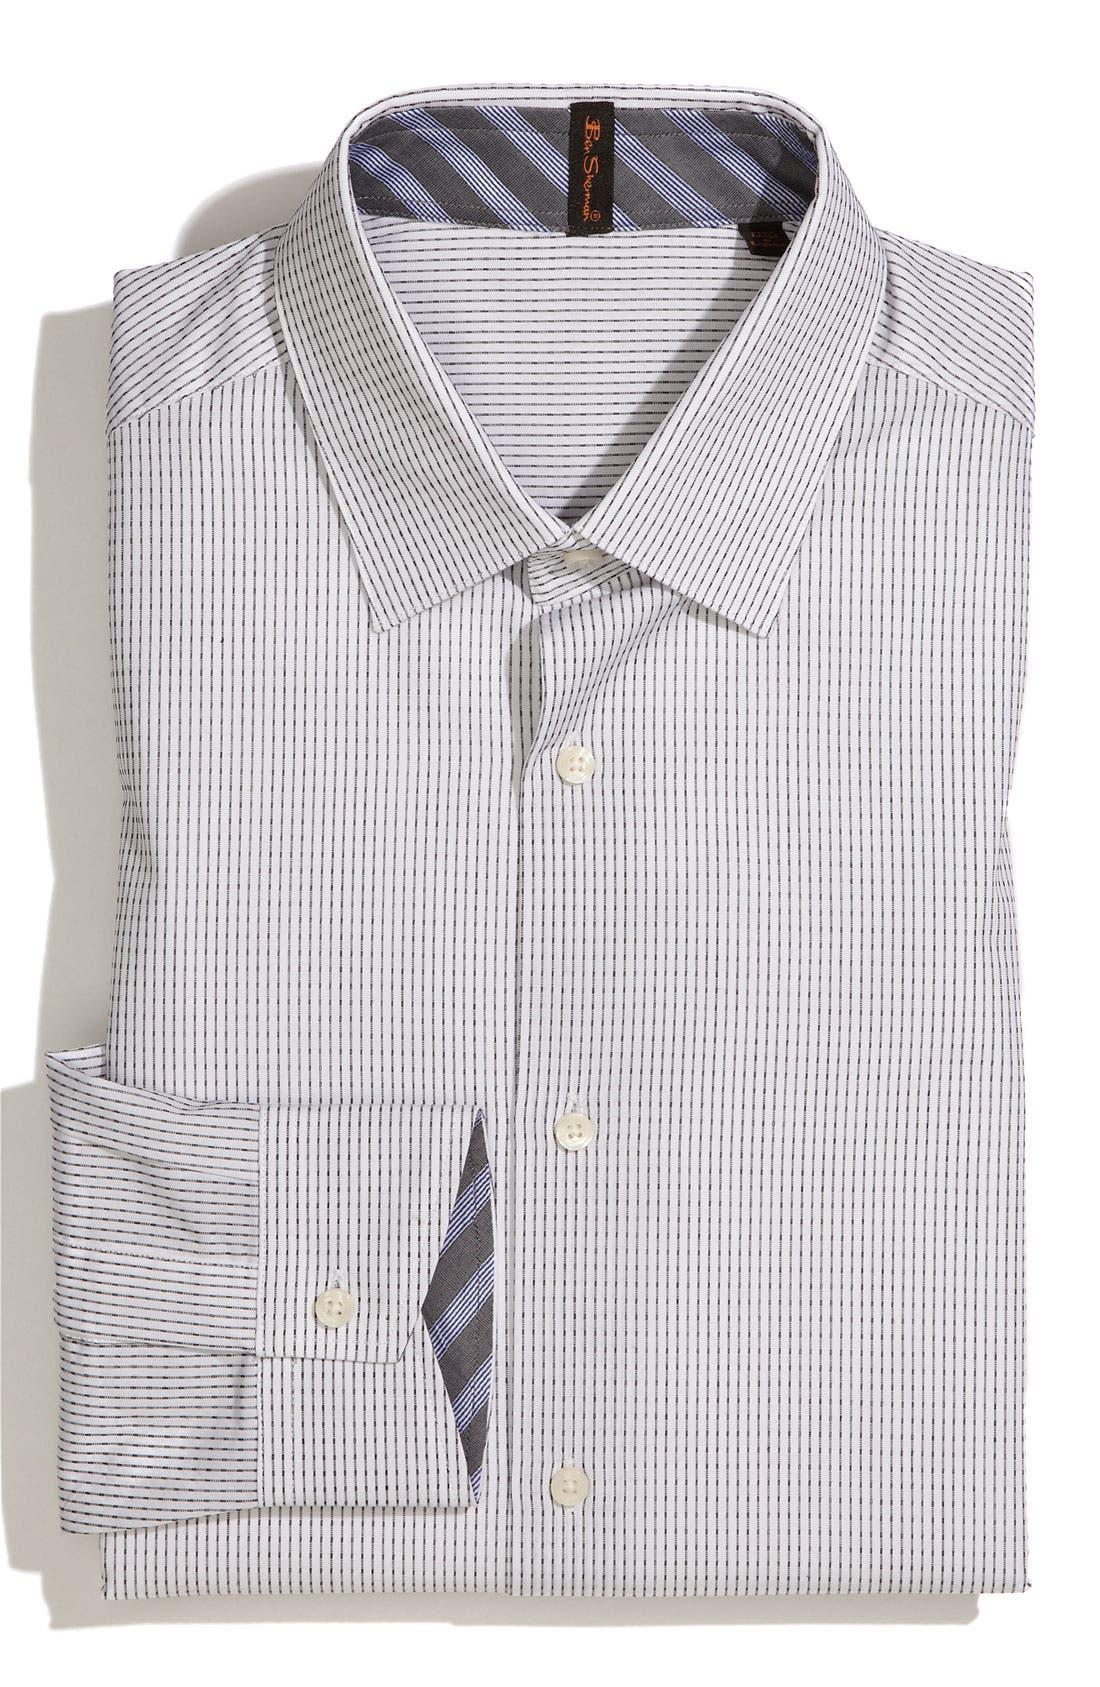 Alternate Image 1 Selected - Ben Sherman Trim Fit Dress Shirt